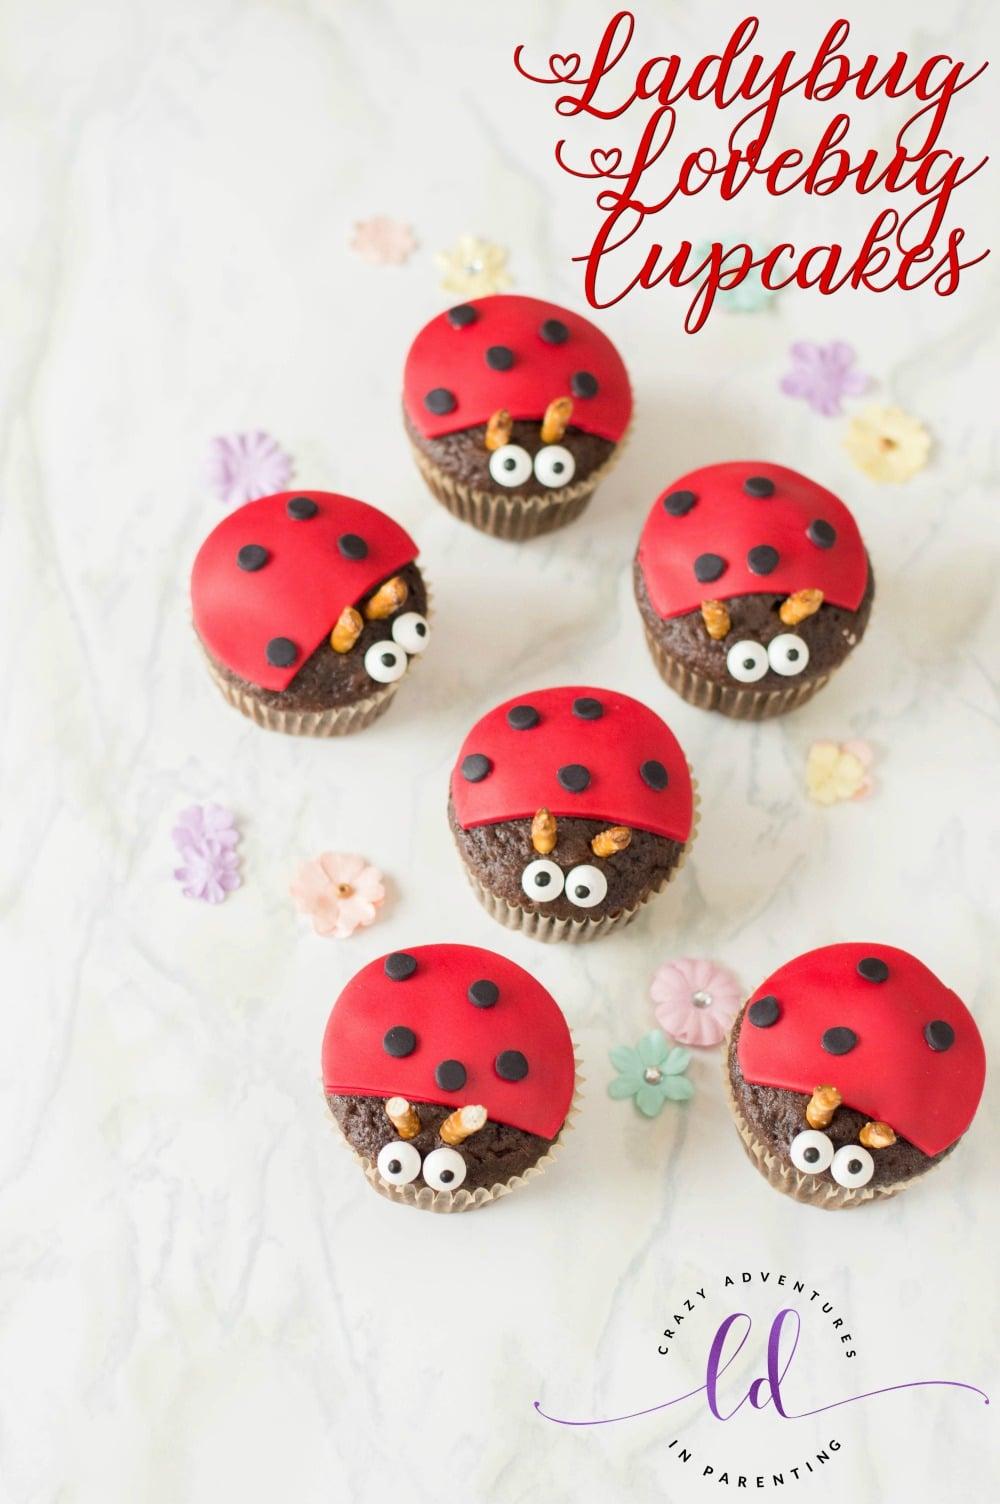 Ladybug Lovebug Cupcakes for Valentines